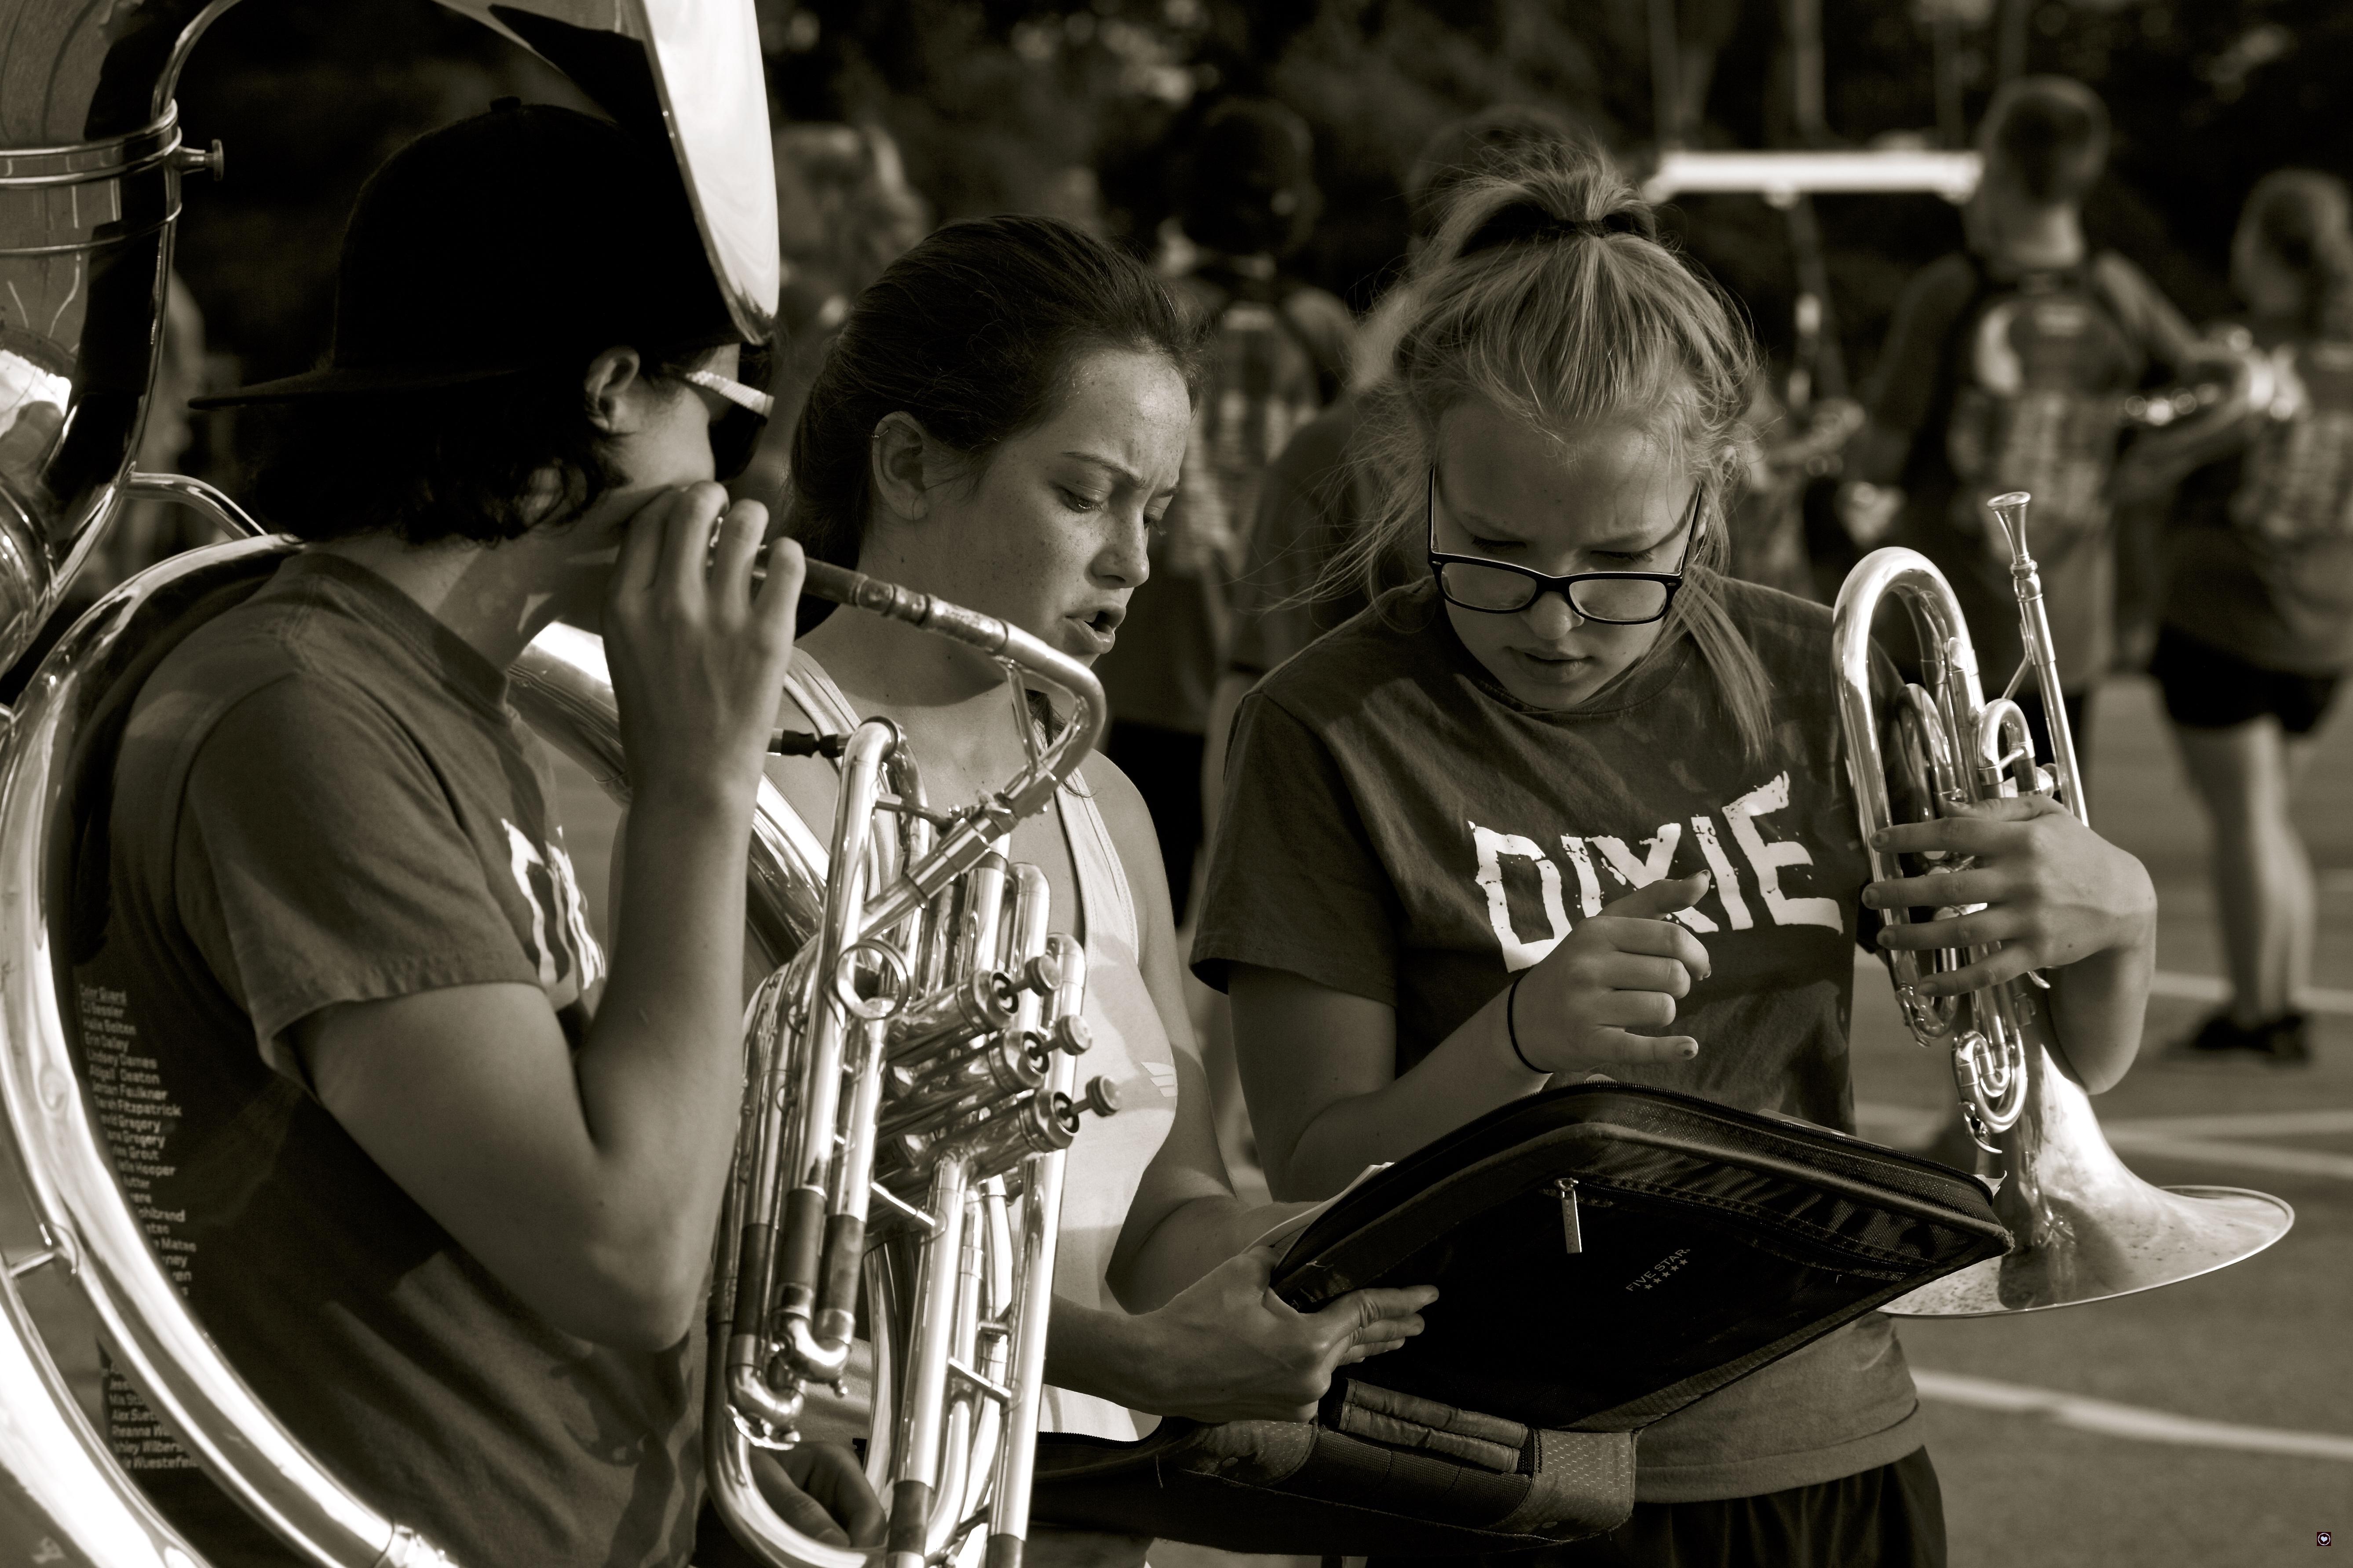 Dixie Band rehearsal Aug 14 & 15